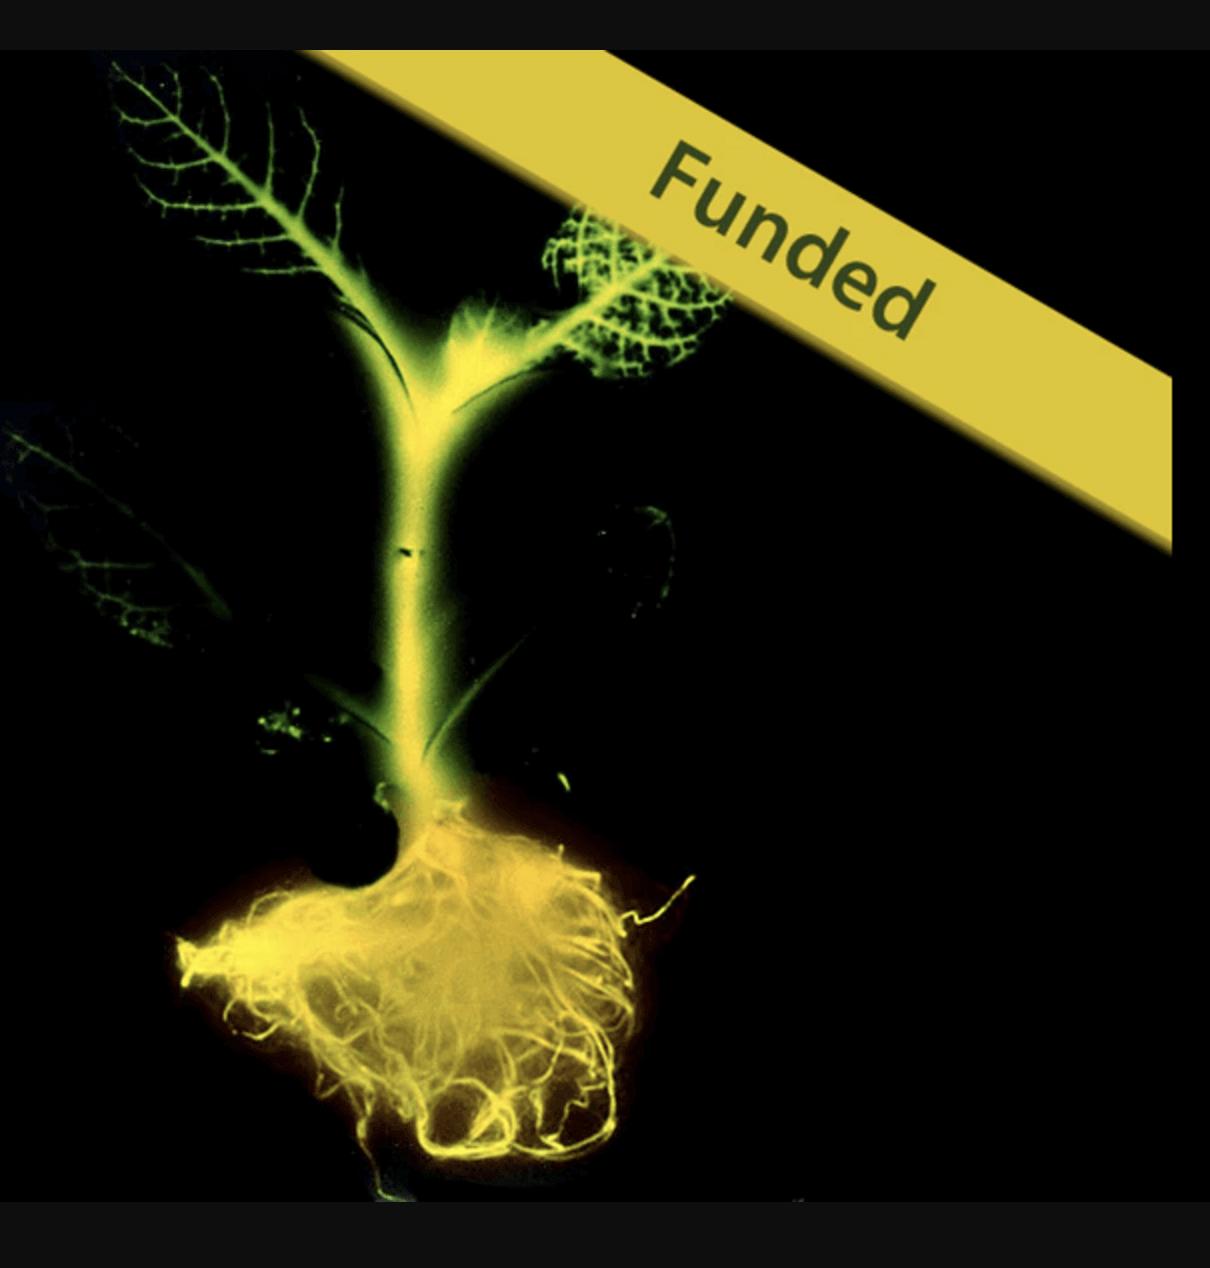 Glowing Plant's failed Kickstarter venture highlights pitfalls of synthetic biology